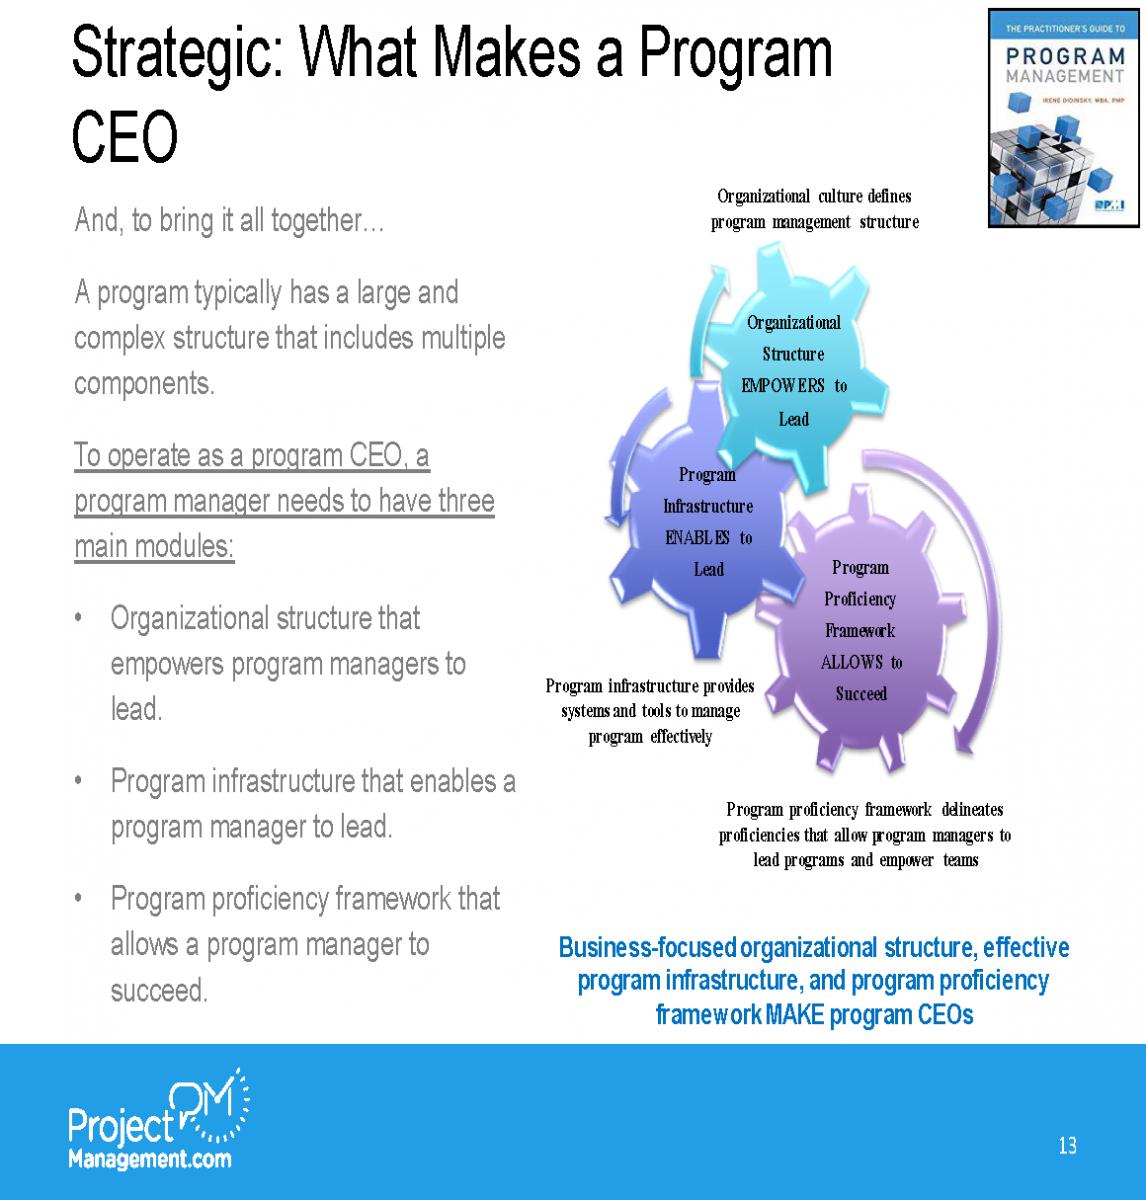 ProjectManagementcom webinar_Irene Didinsky_05112018_FinalFinal_Page_17